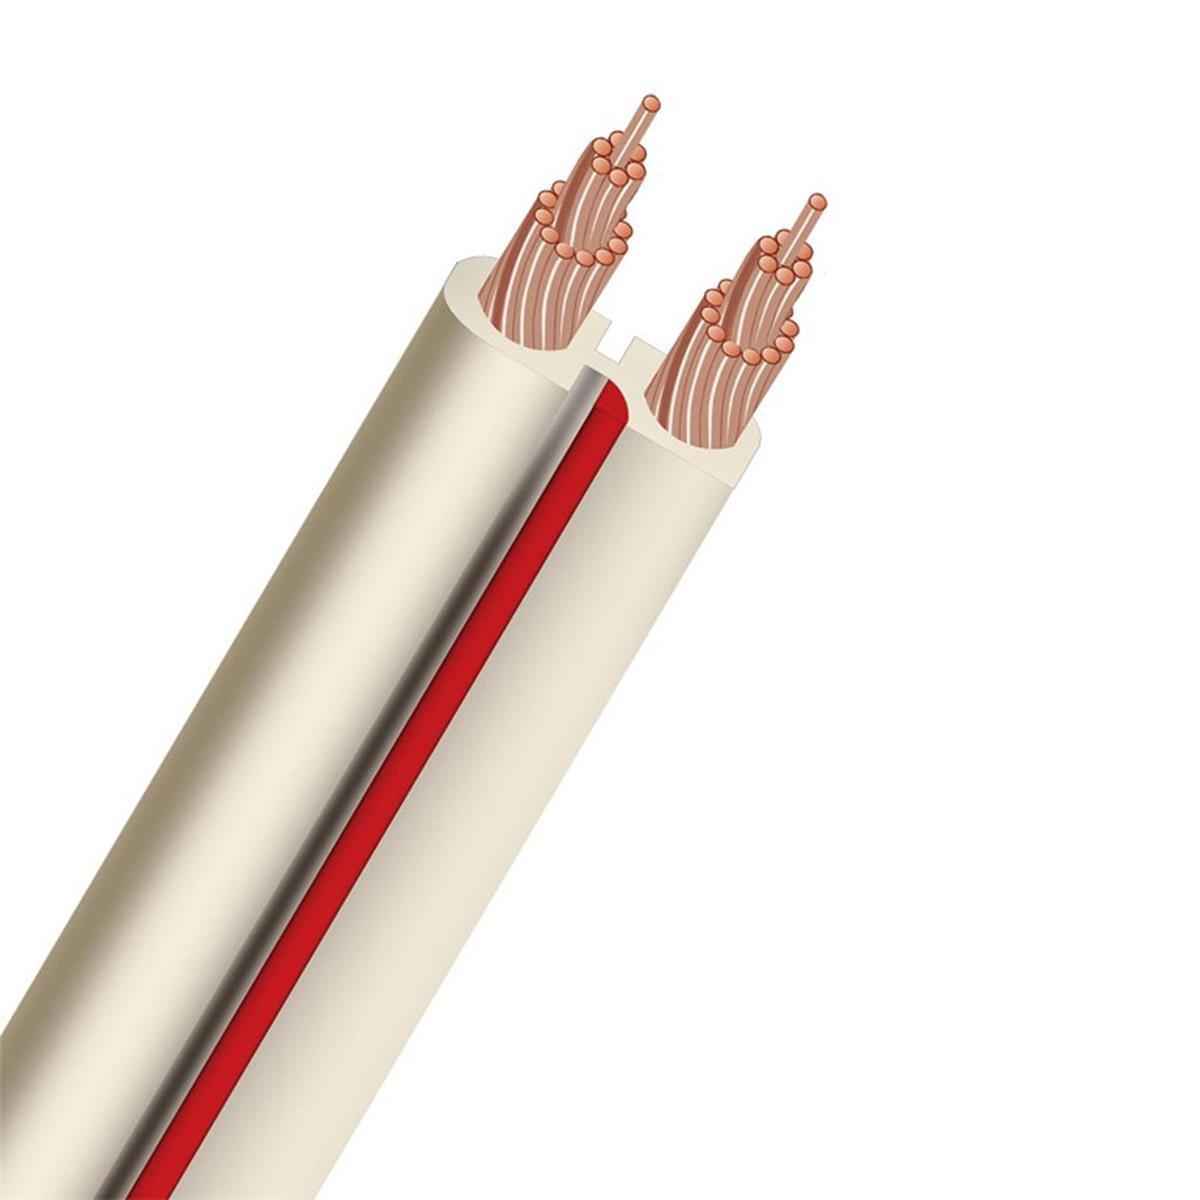 Amazon.com: AudioQuest X-2 Flat Series 14 Gauge Speaker Cable 100 ft ...